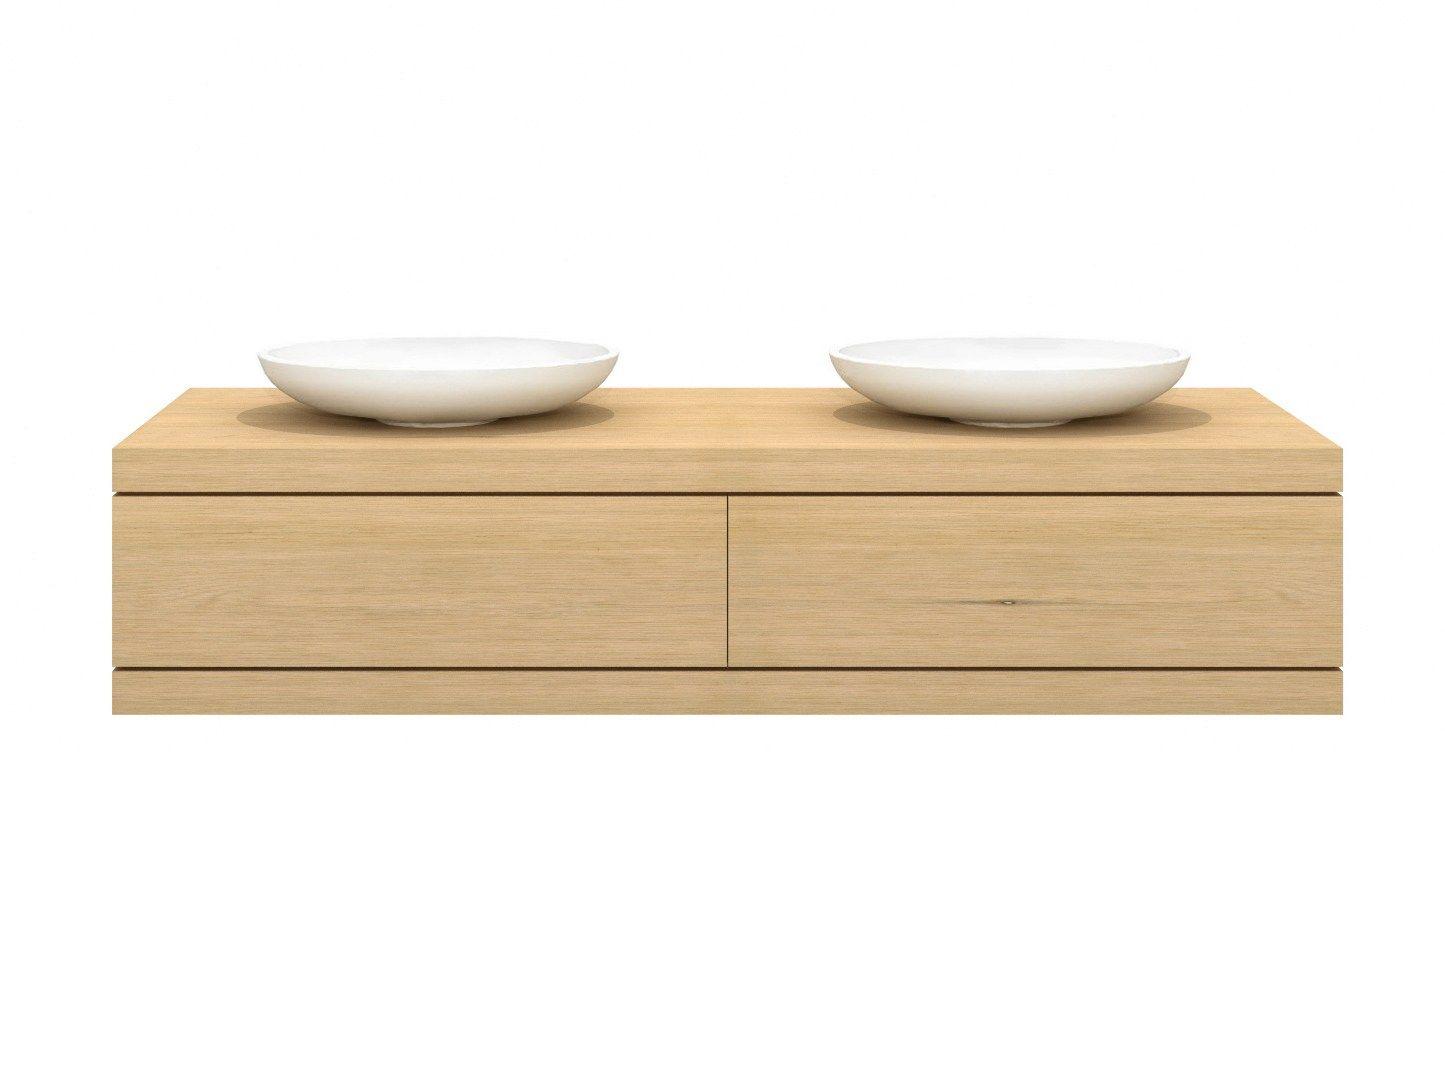 oak cadence meuble sous vasque double by ethnicraft. Black Bedroom Furniture Sets. Home Design Ideas